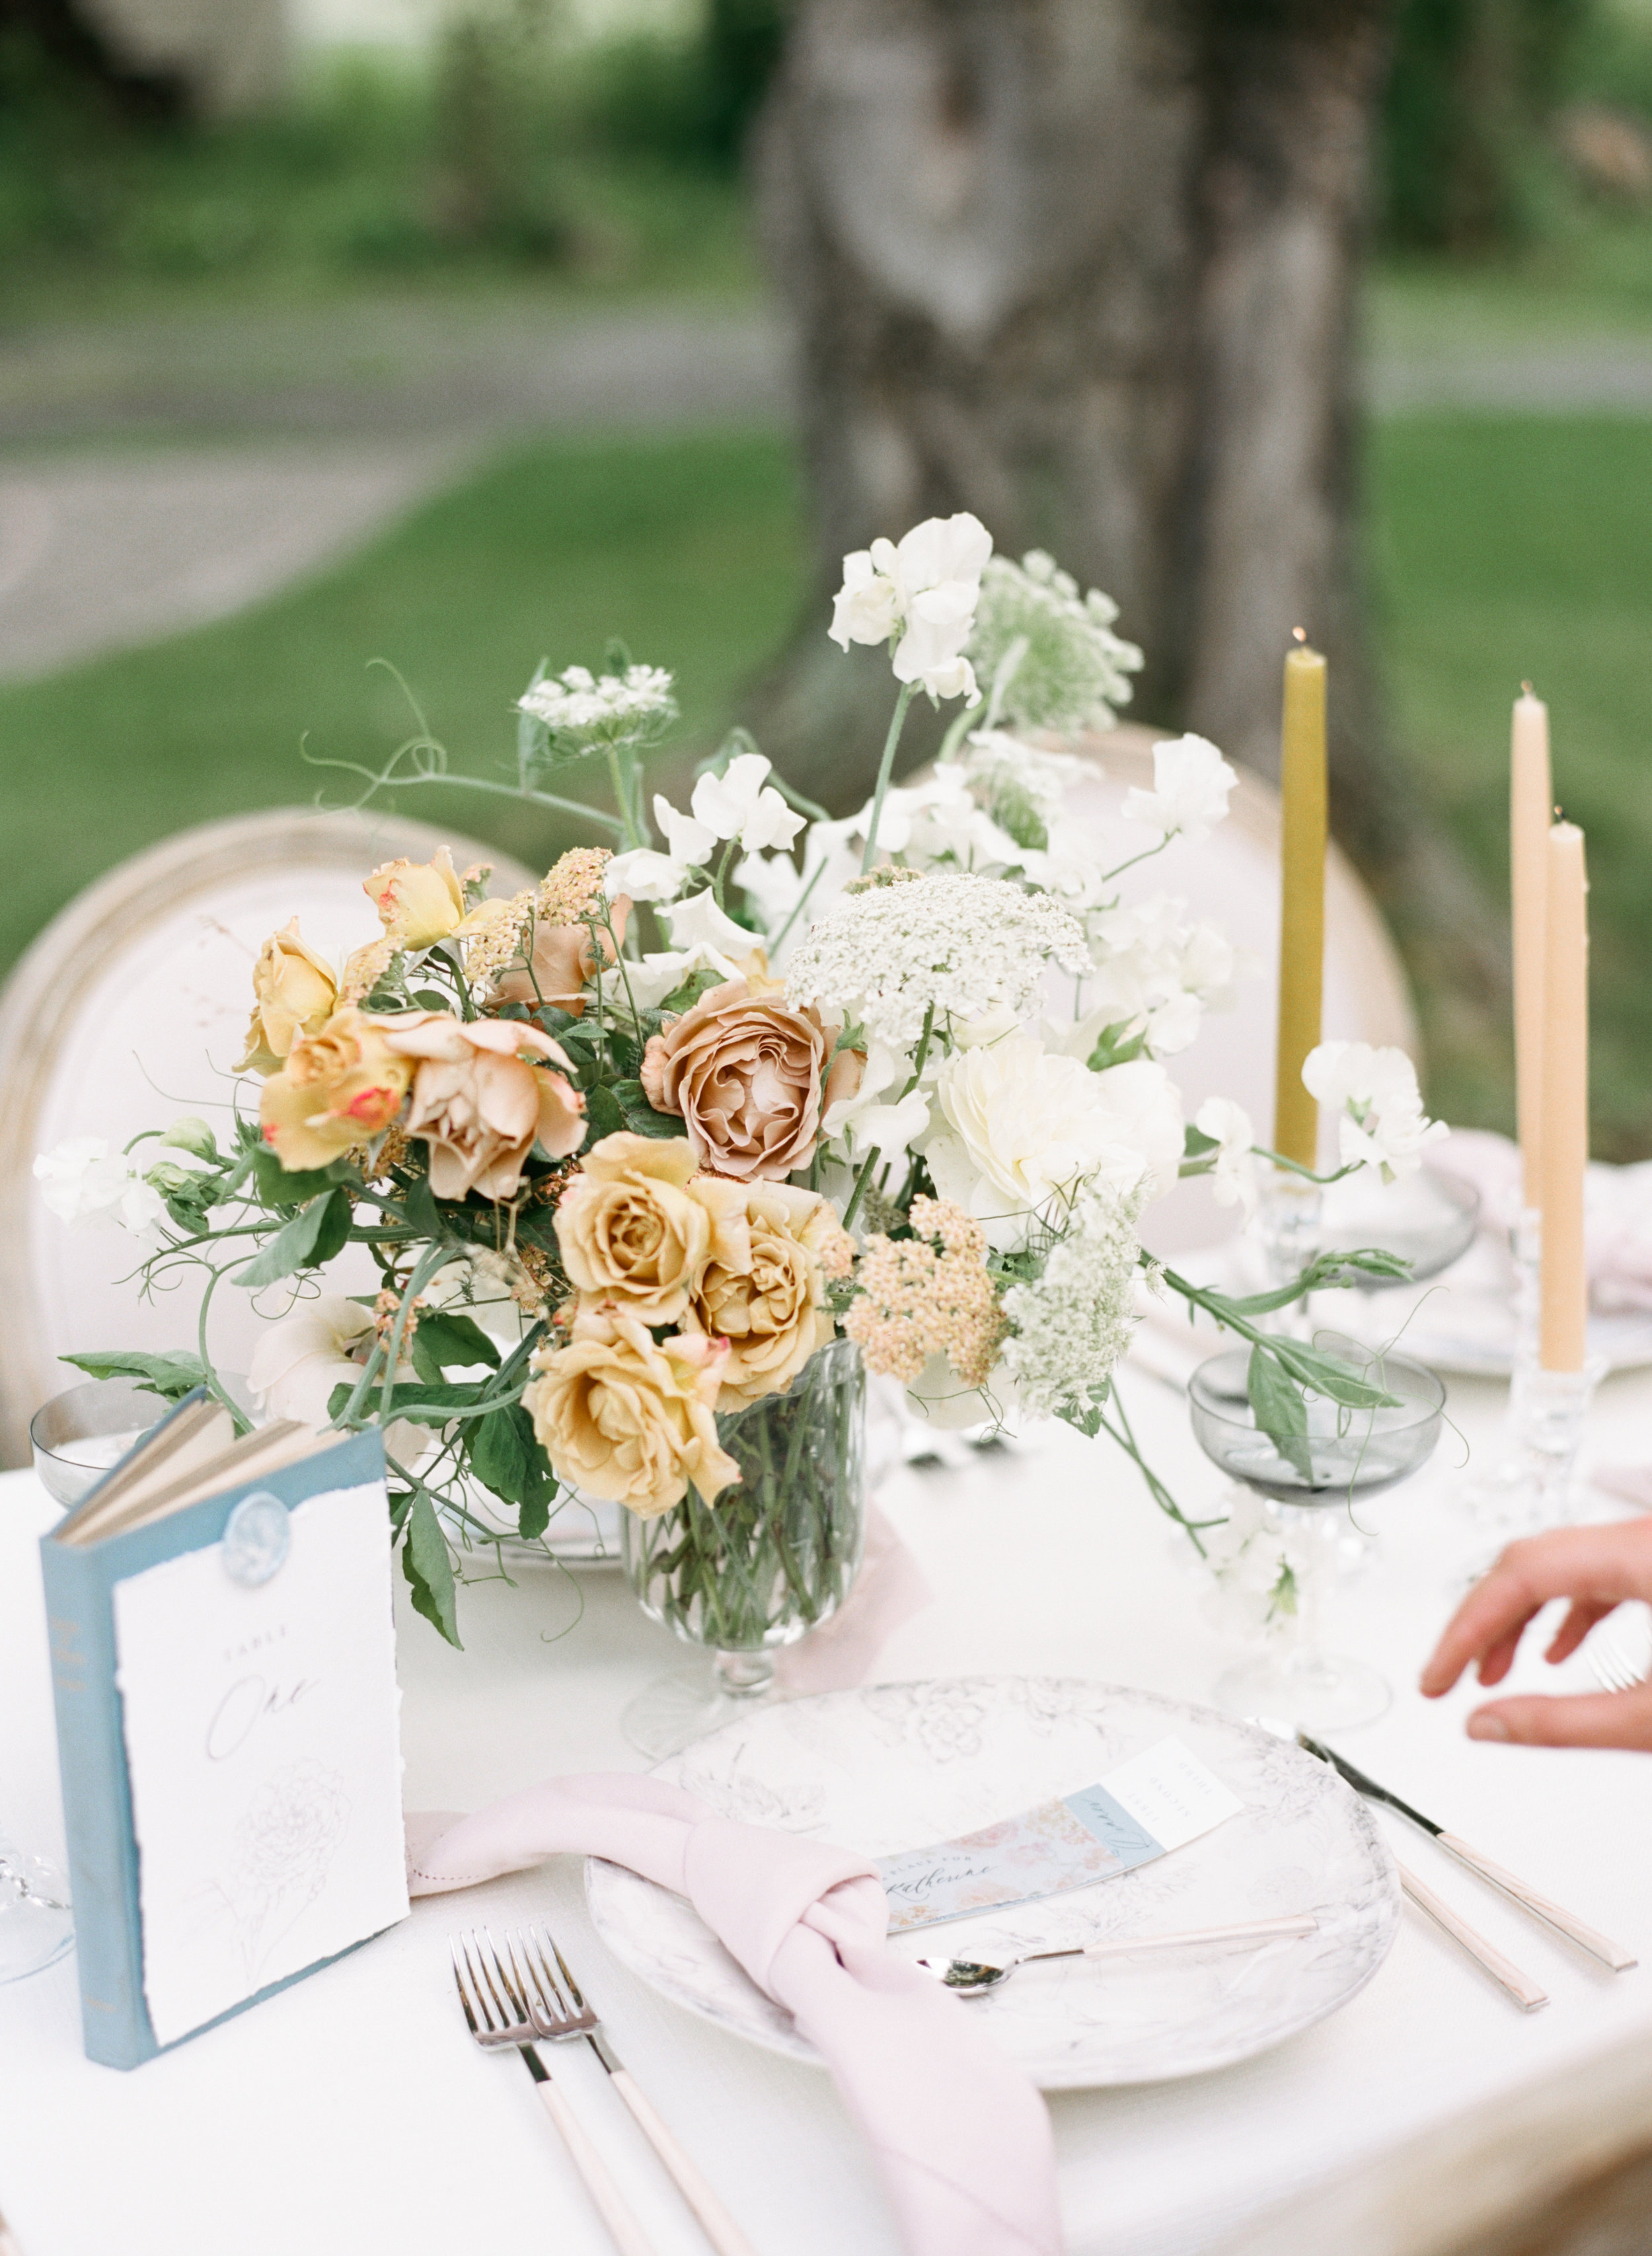 alexandra-meseke-understated-soft-luxury-wedding-upstate-ny_0135.jpg